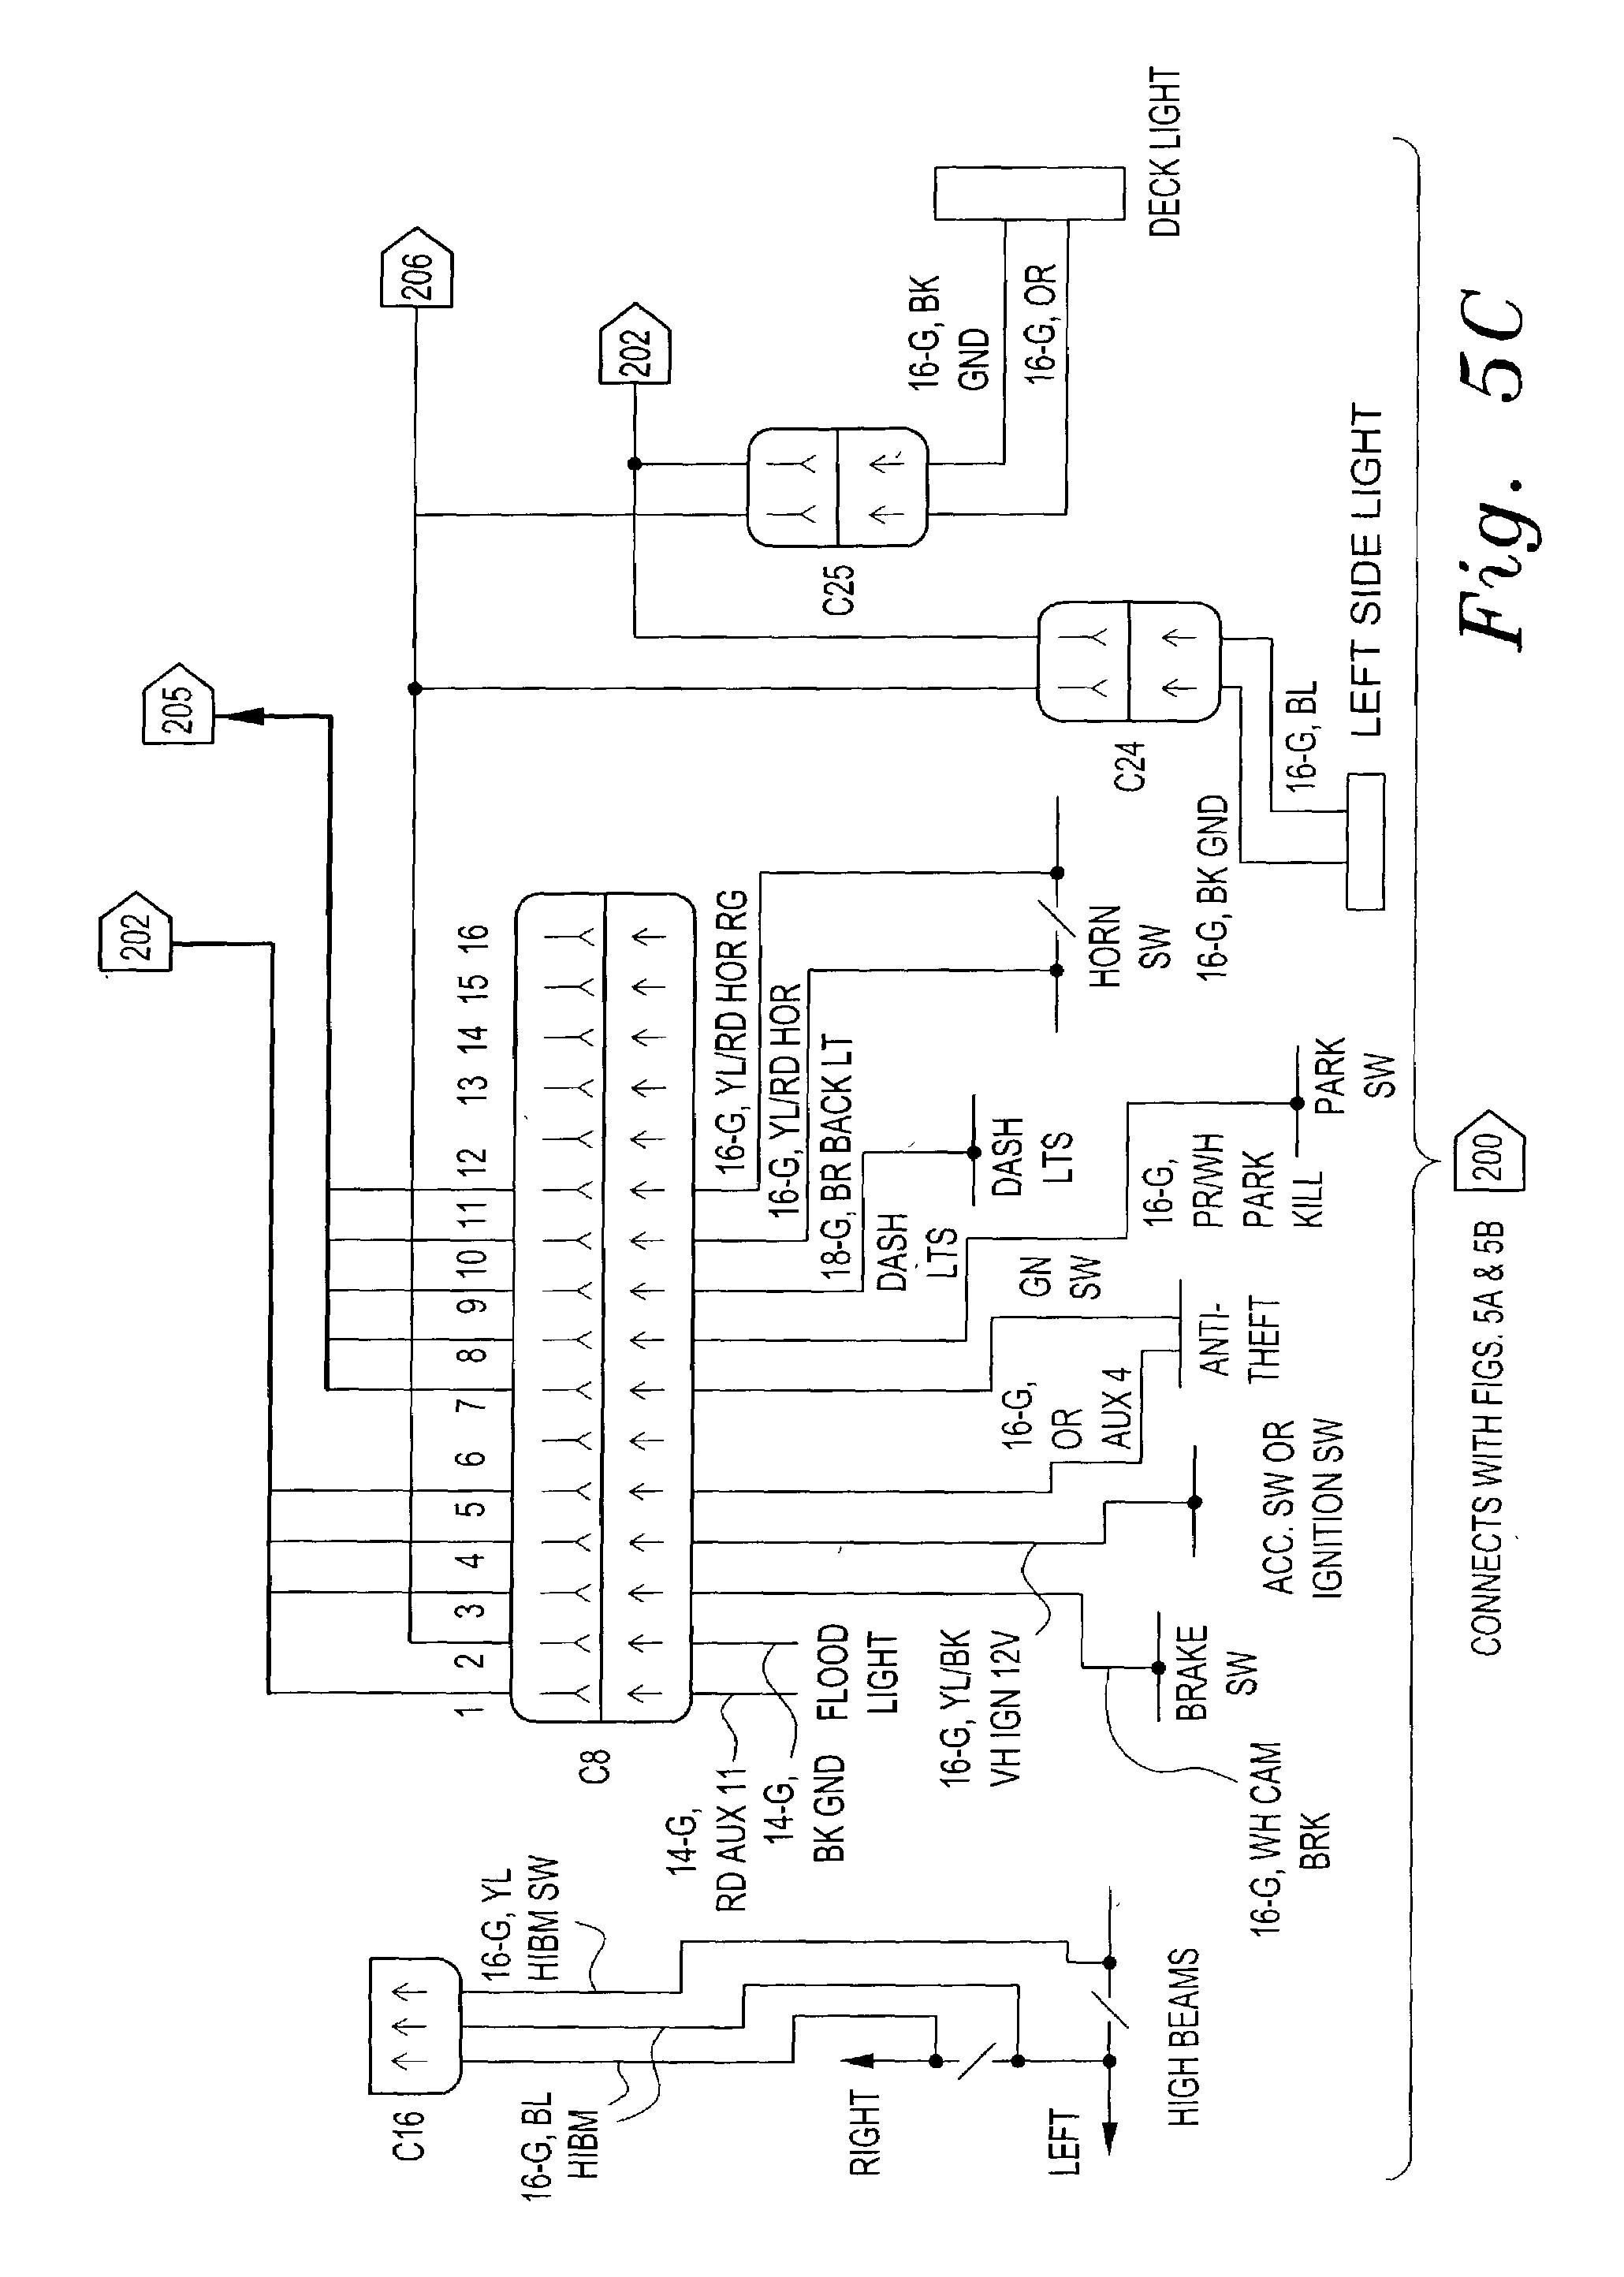 whelen siren wiring diagram Download-Wiring Diagram for Whelen Siren New Ausgezeichnet Whelen Sirene 295hfsa1 Drahtdiagramm Ideen 13-b